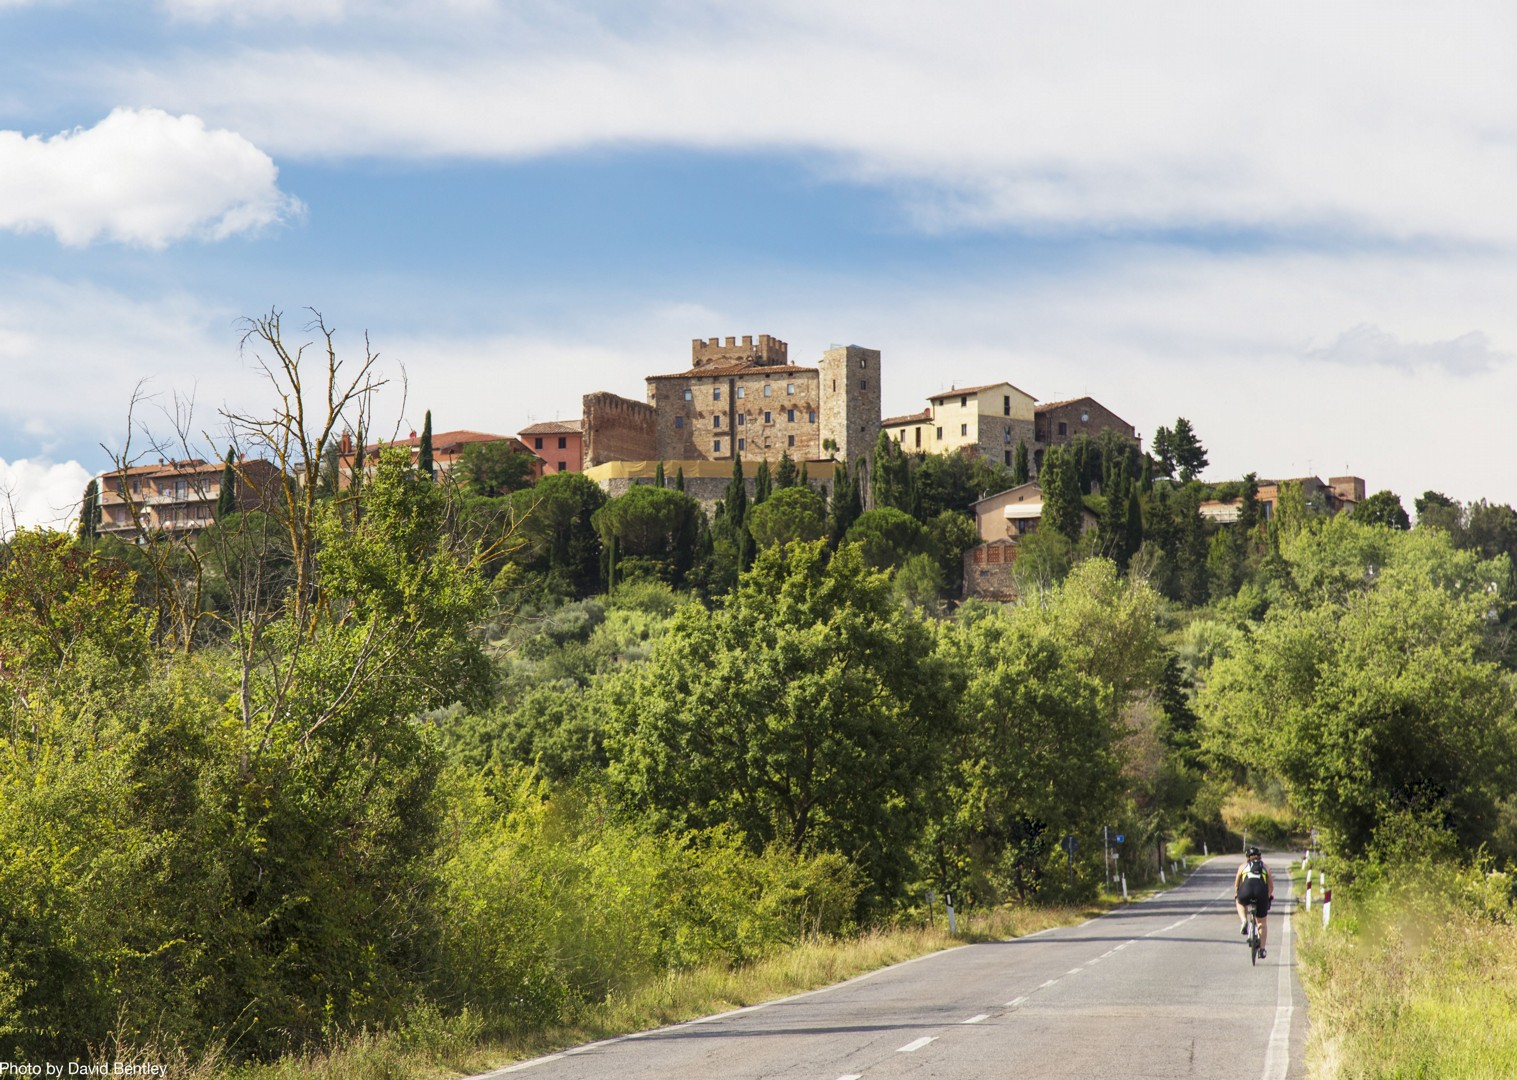 road-cycling-in-tuscany-italy.jpg - Italy - Tuscany Tourer - Guided Road Cycling Holiday - Italia Road Cycling